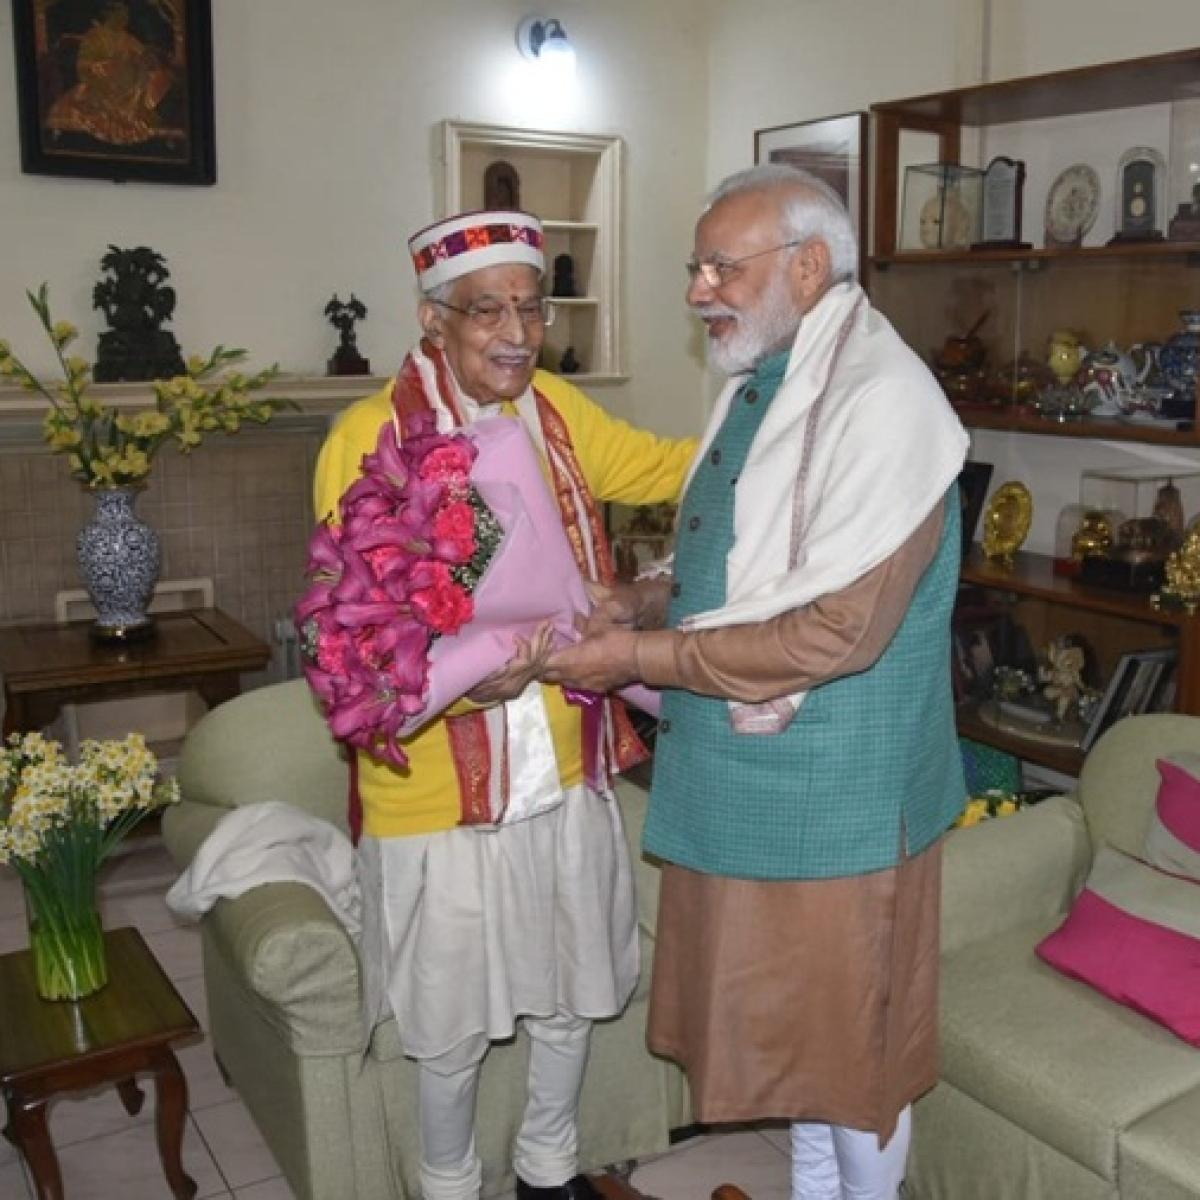 PM Modi meets Murli Manohar Joshi on his birthday, extends greeting